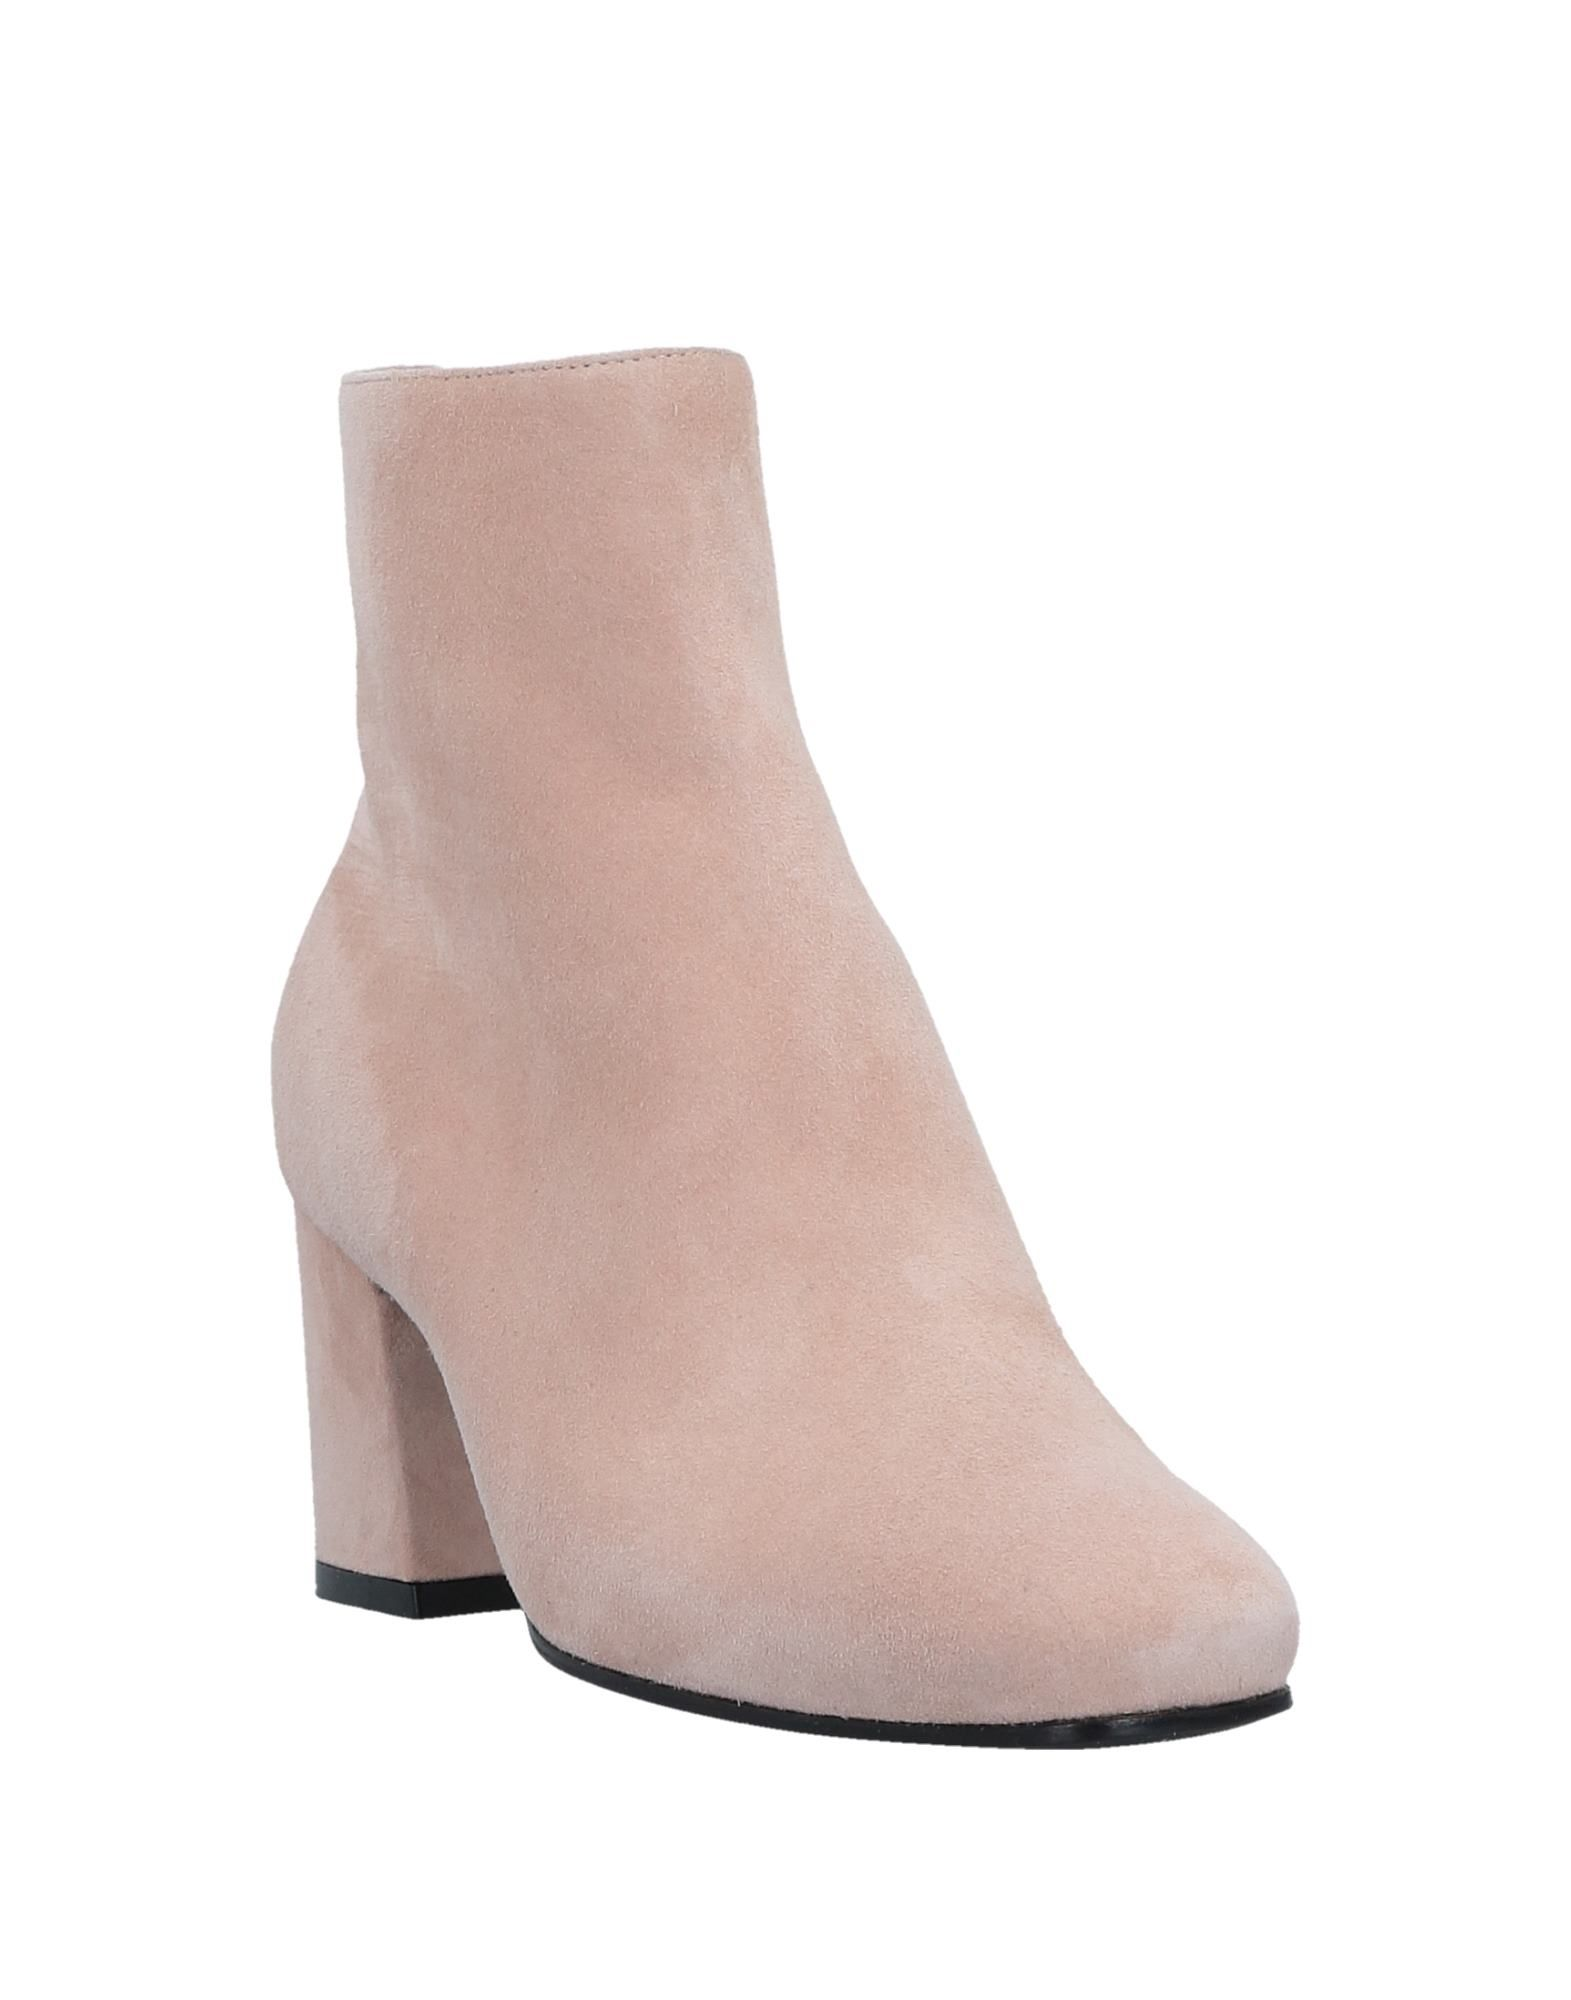 Le Silla Stiefelette Damen Neue  11530748JB Neue Damen Schuhe ae4549